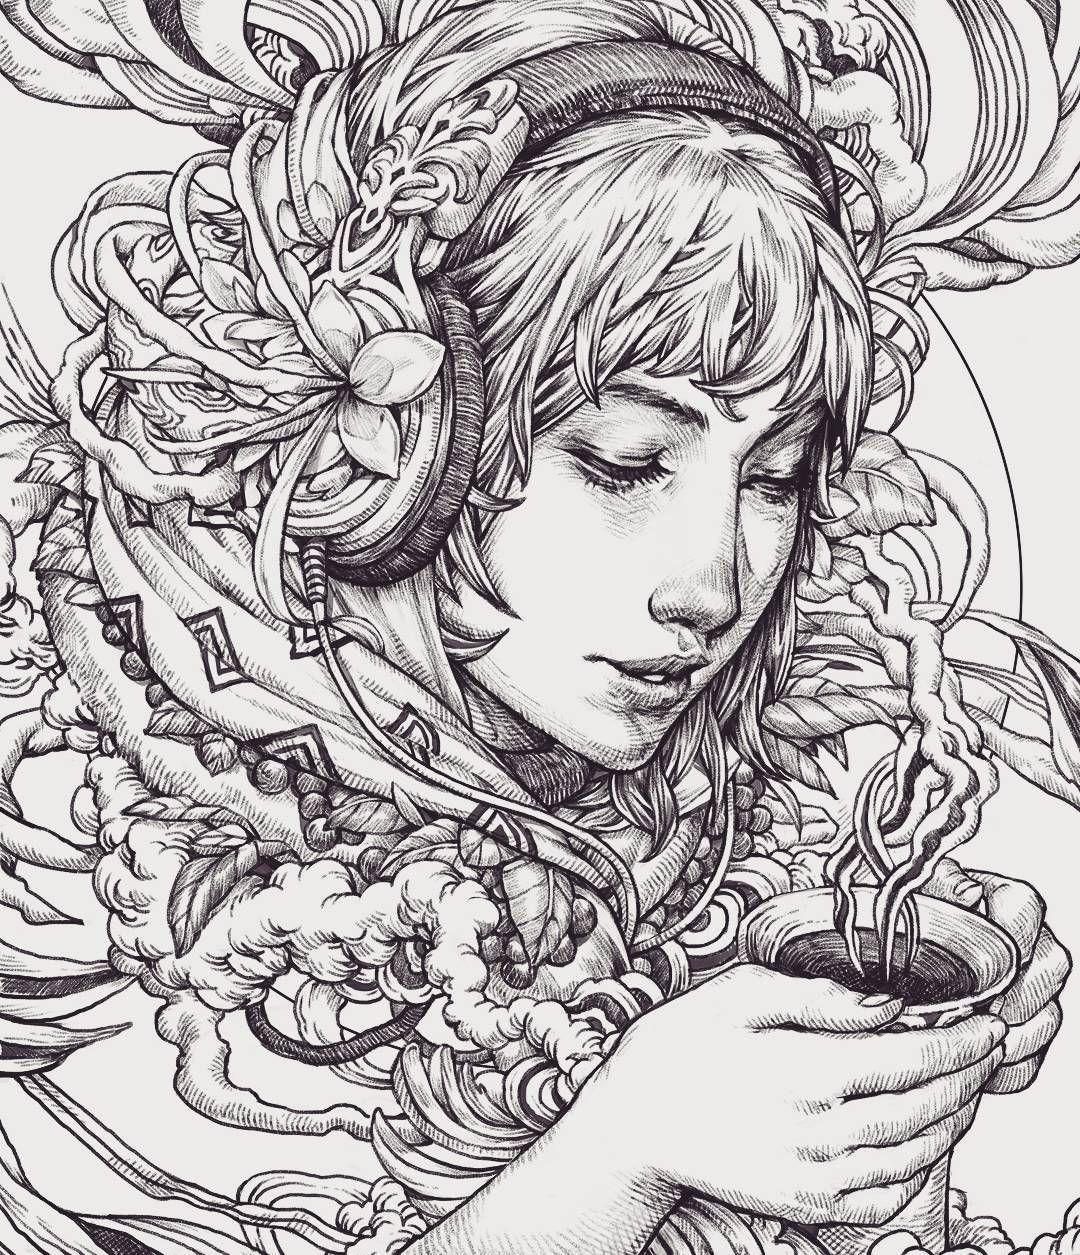 Morning Coffee In Bali Sketch Lineart Illustration Arttravel Drawings Instaart Coloring Travel Nickfilbert Indonesia